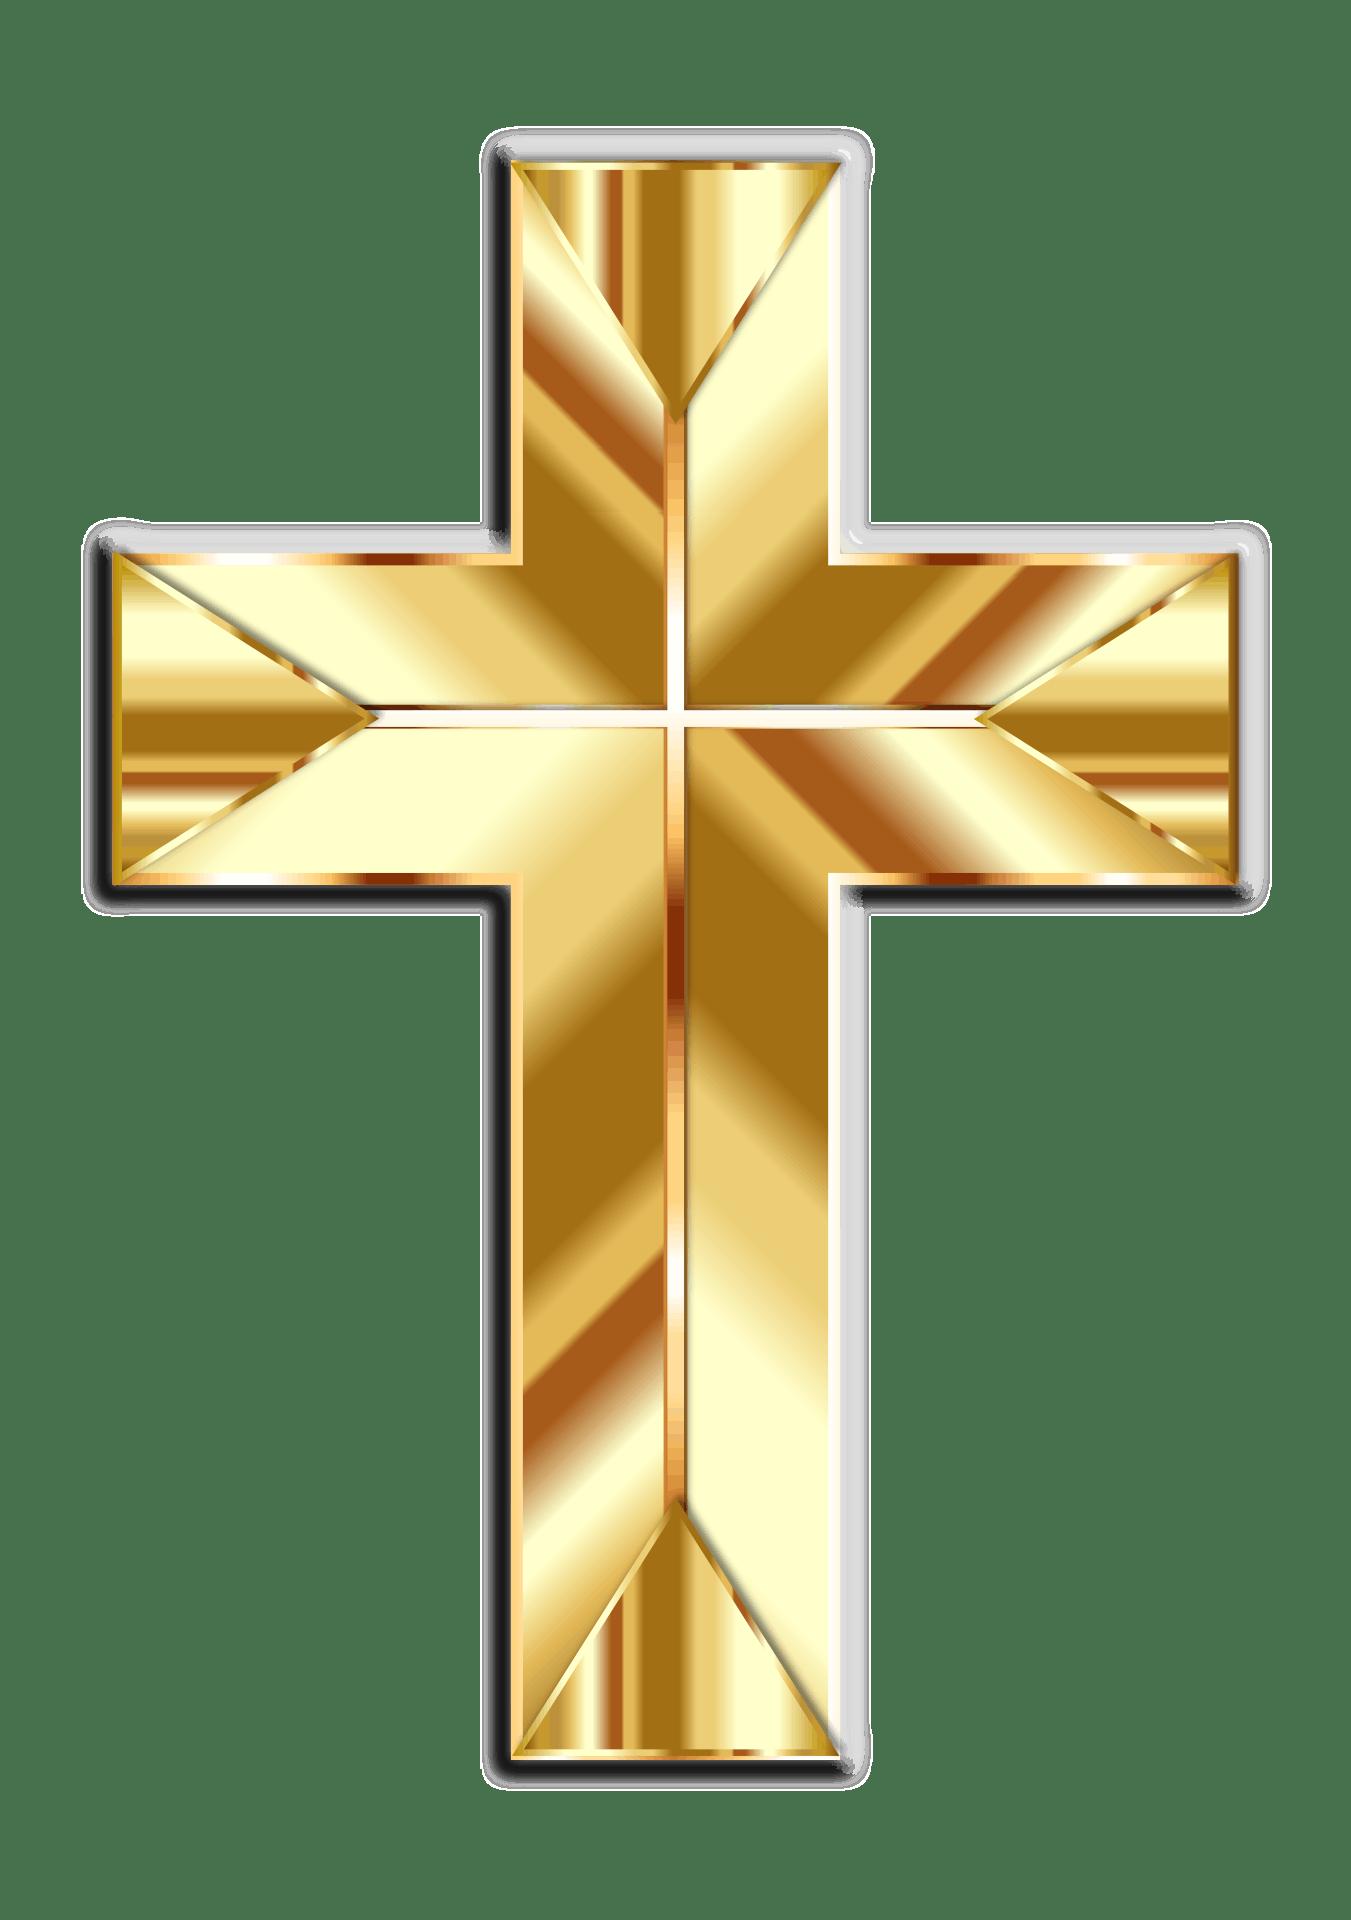 Jesus Christ Offers True Salvation To People